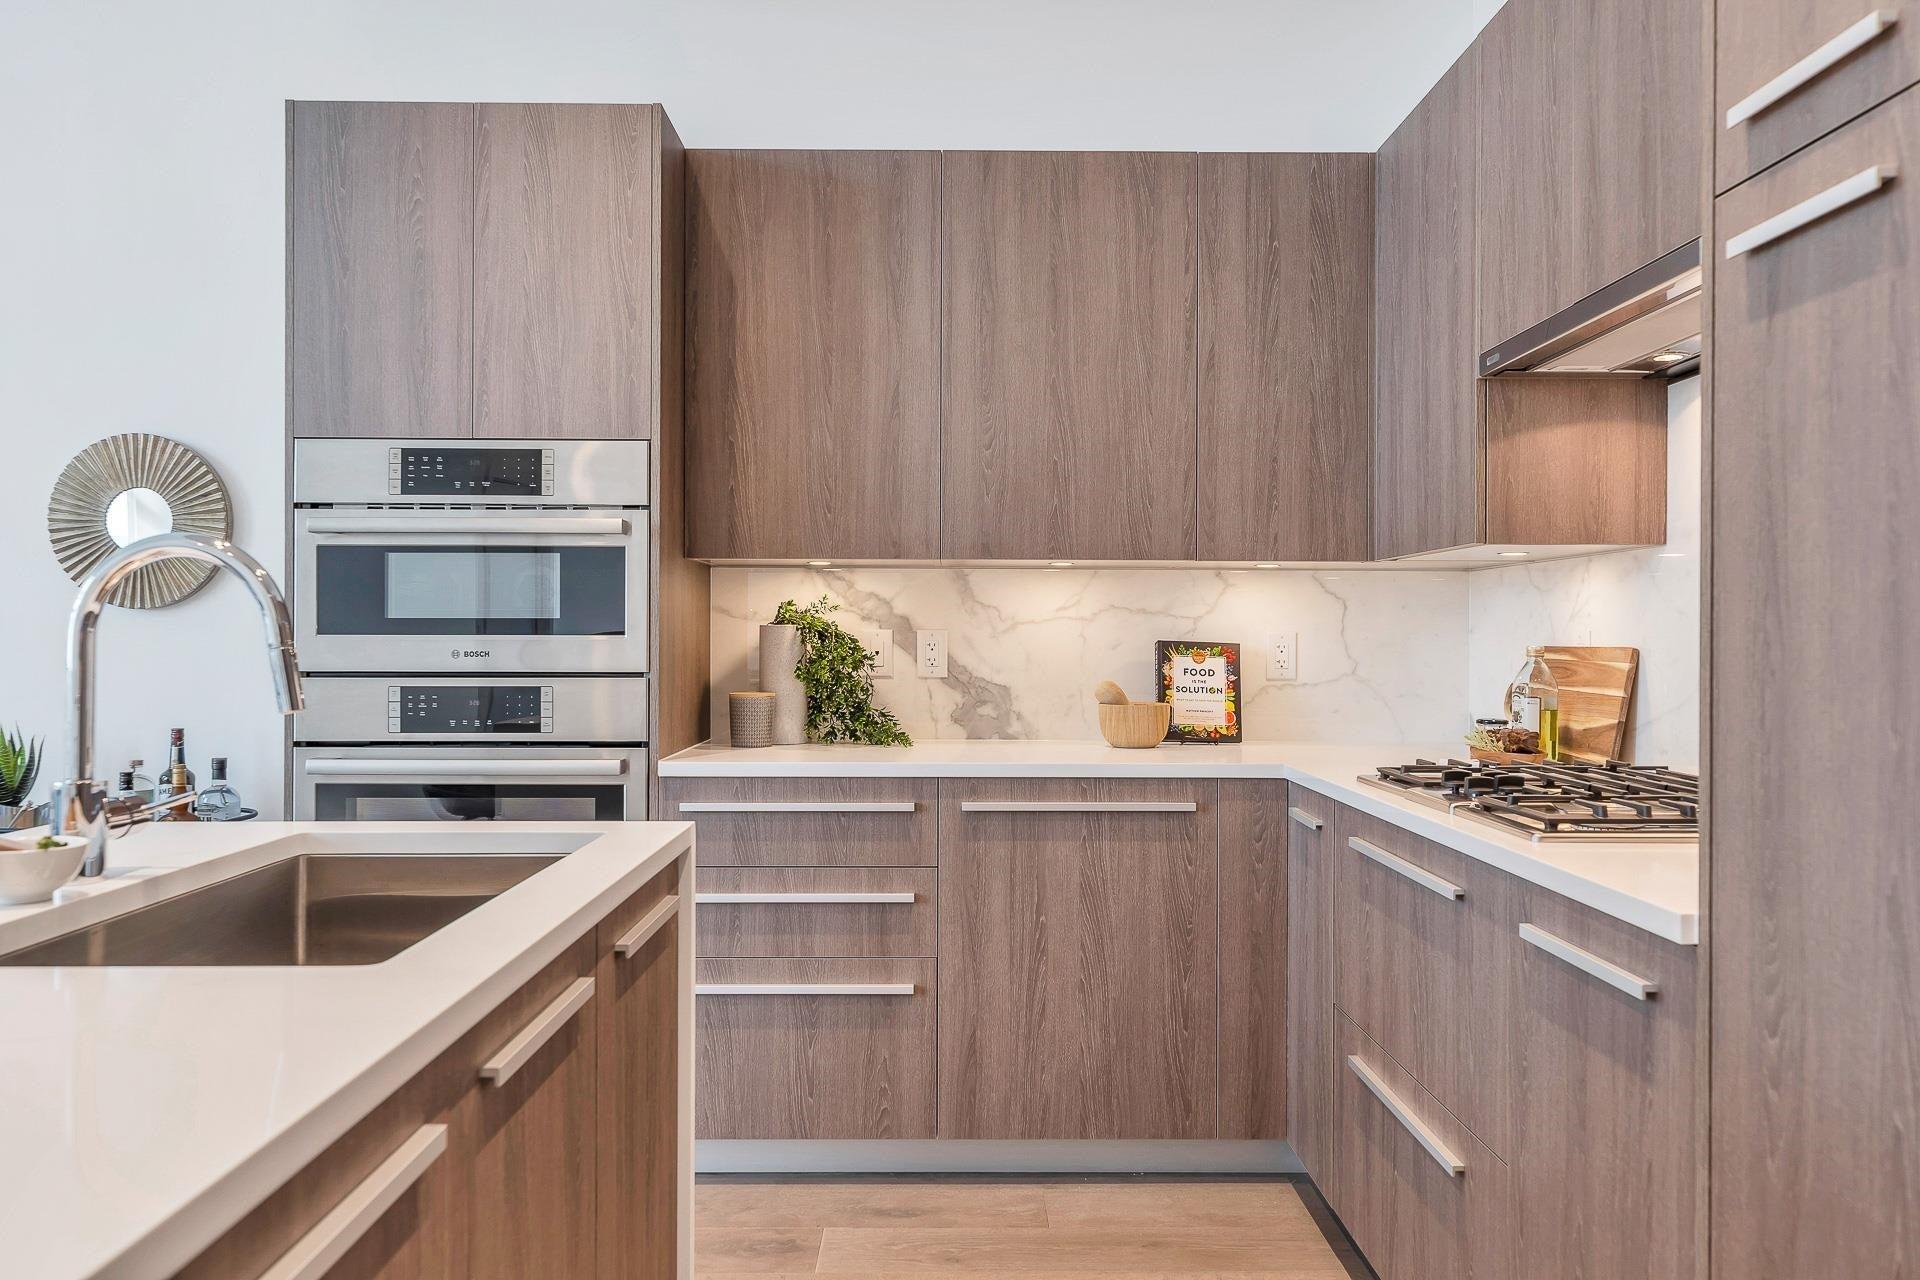 702 2780 VALLEY CENTRE AVENUE - Lynn Valley Apartment/Condo for sale, 3 Bedrooms (R2622279) - #10